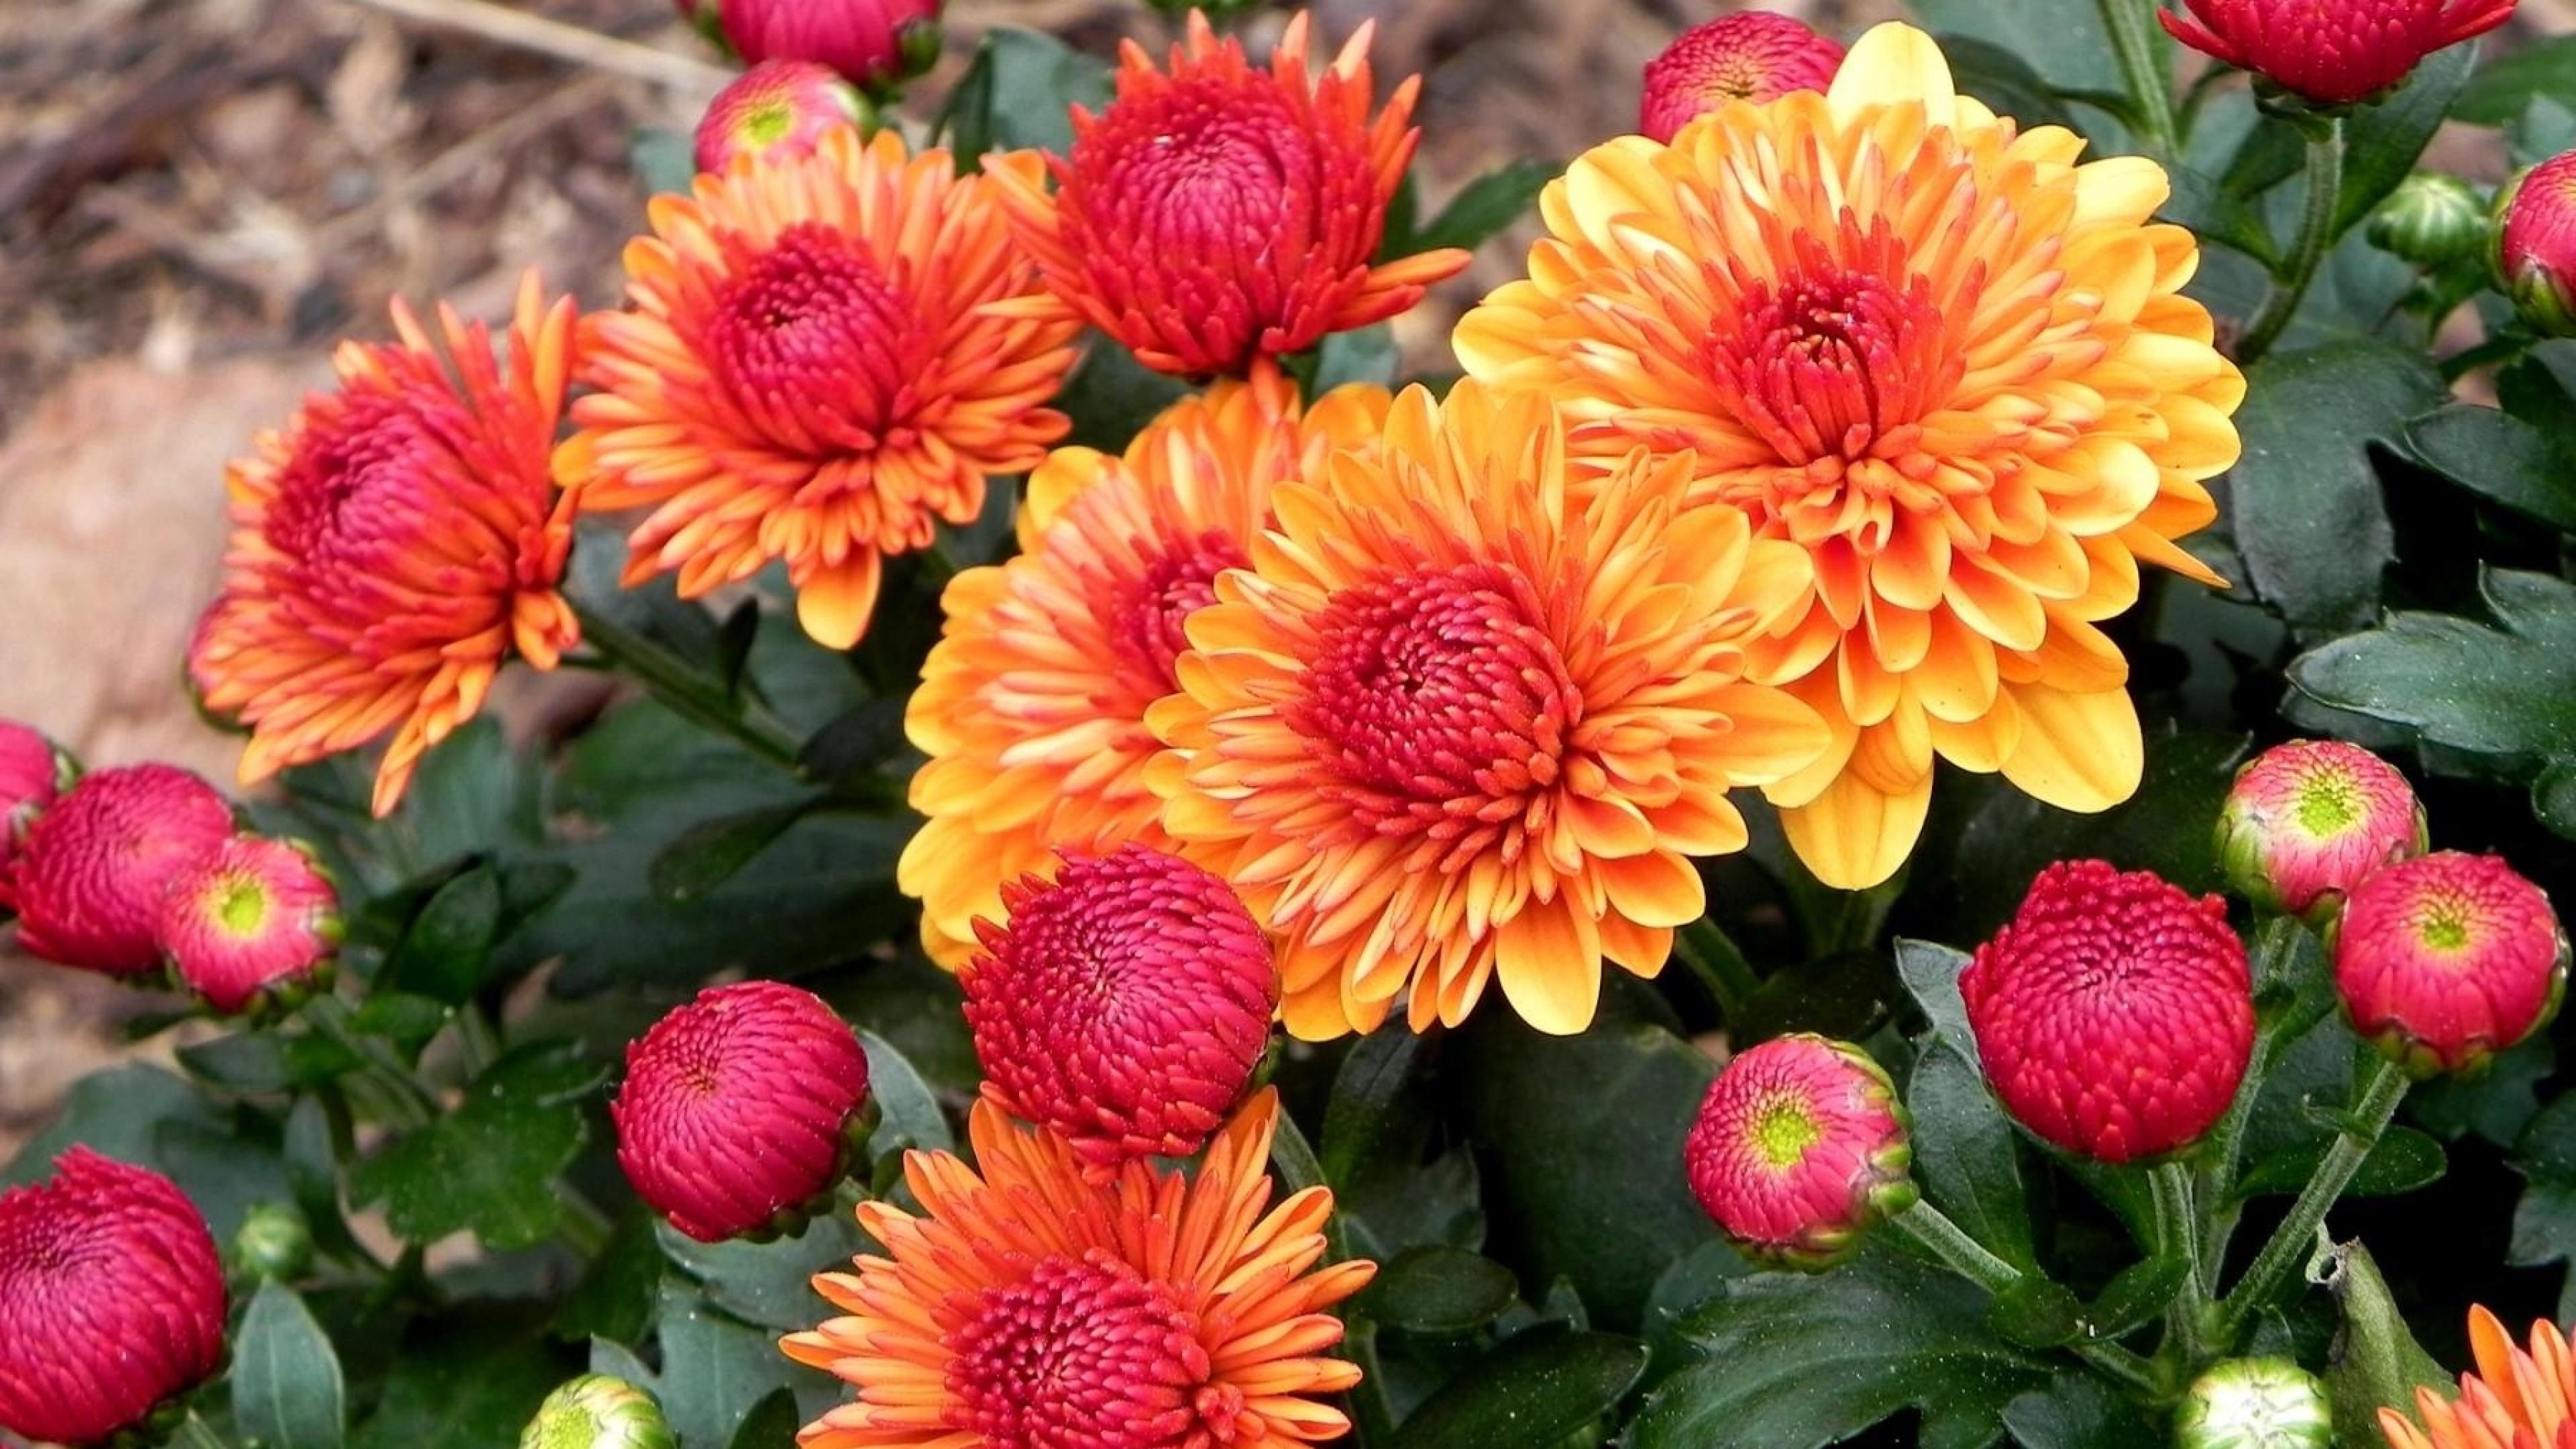 dahlias_flowers_leaves_buds_many_62410_3840x2160.jpg